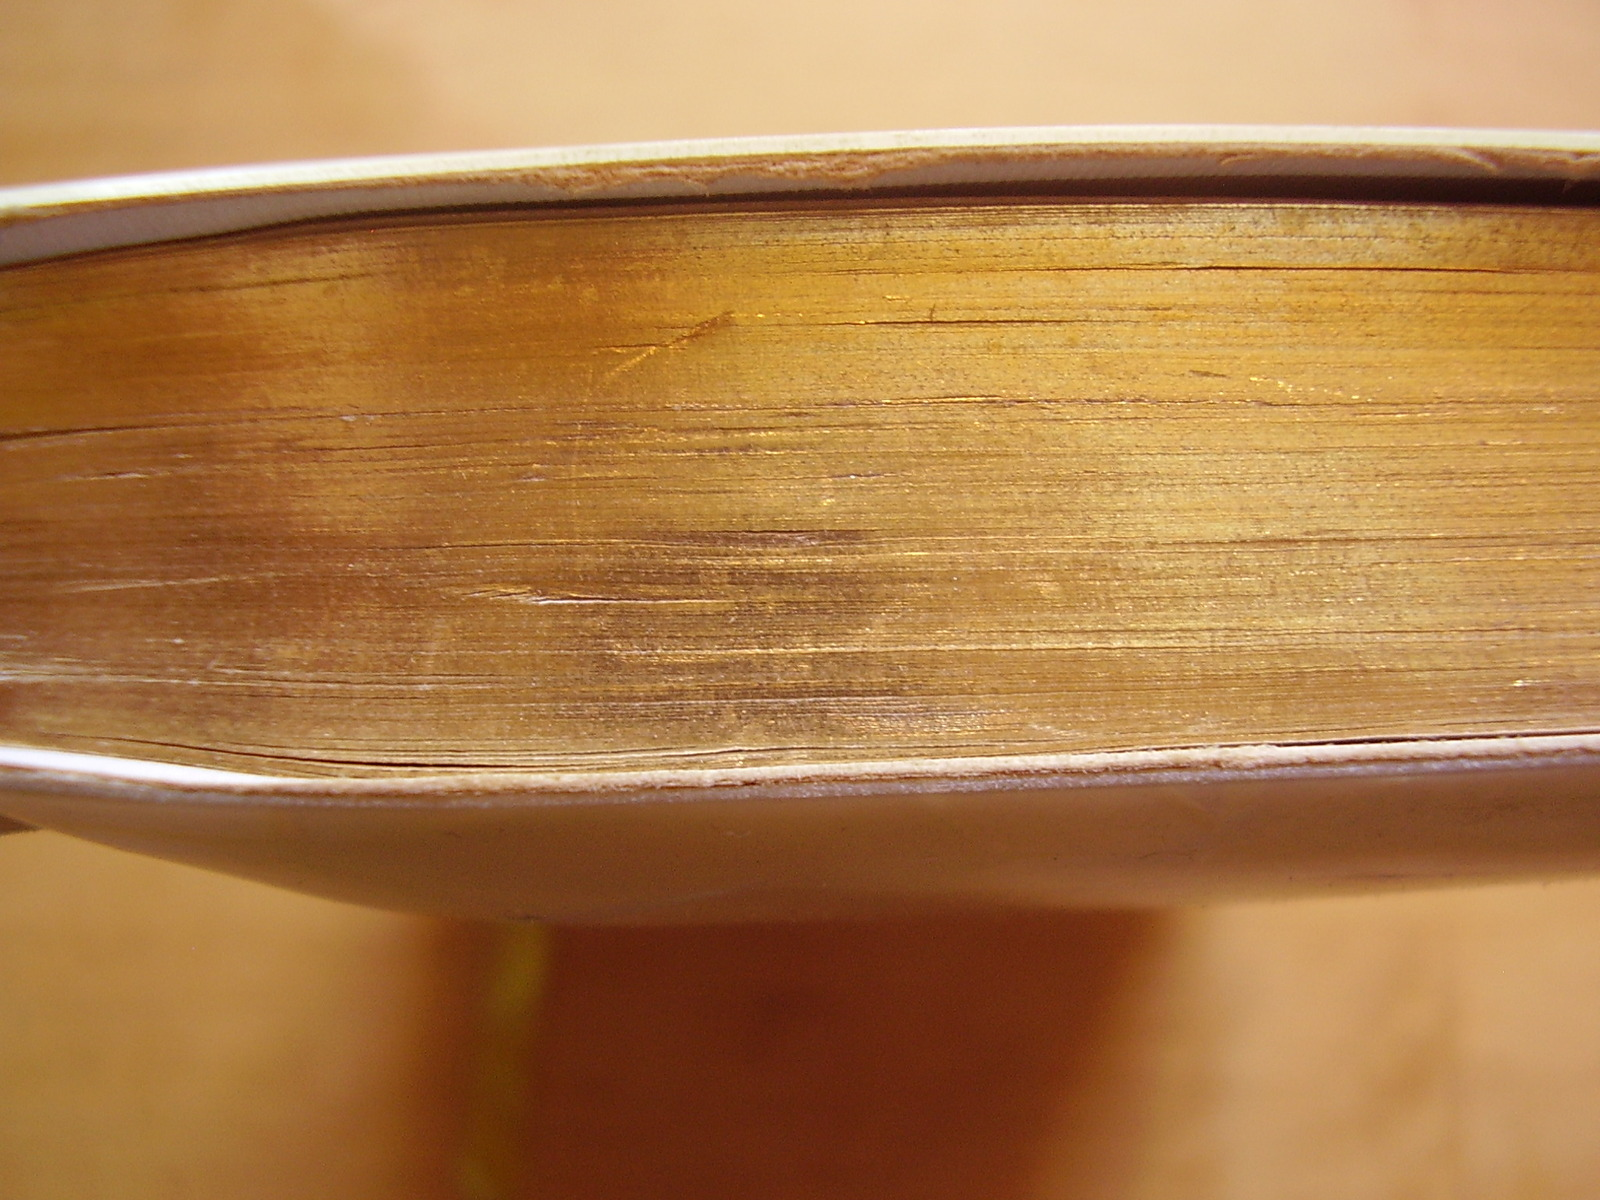 Roman Missal - Rare Antique Edition image 5